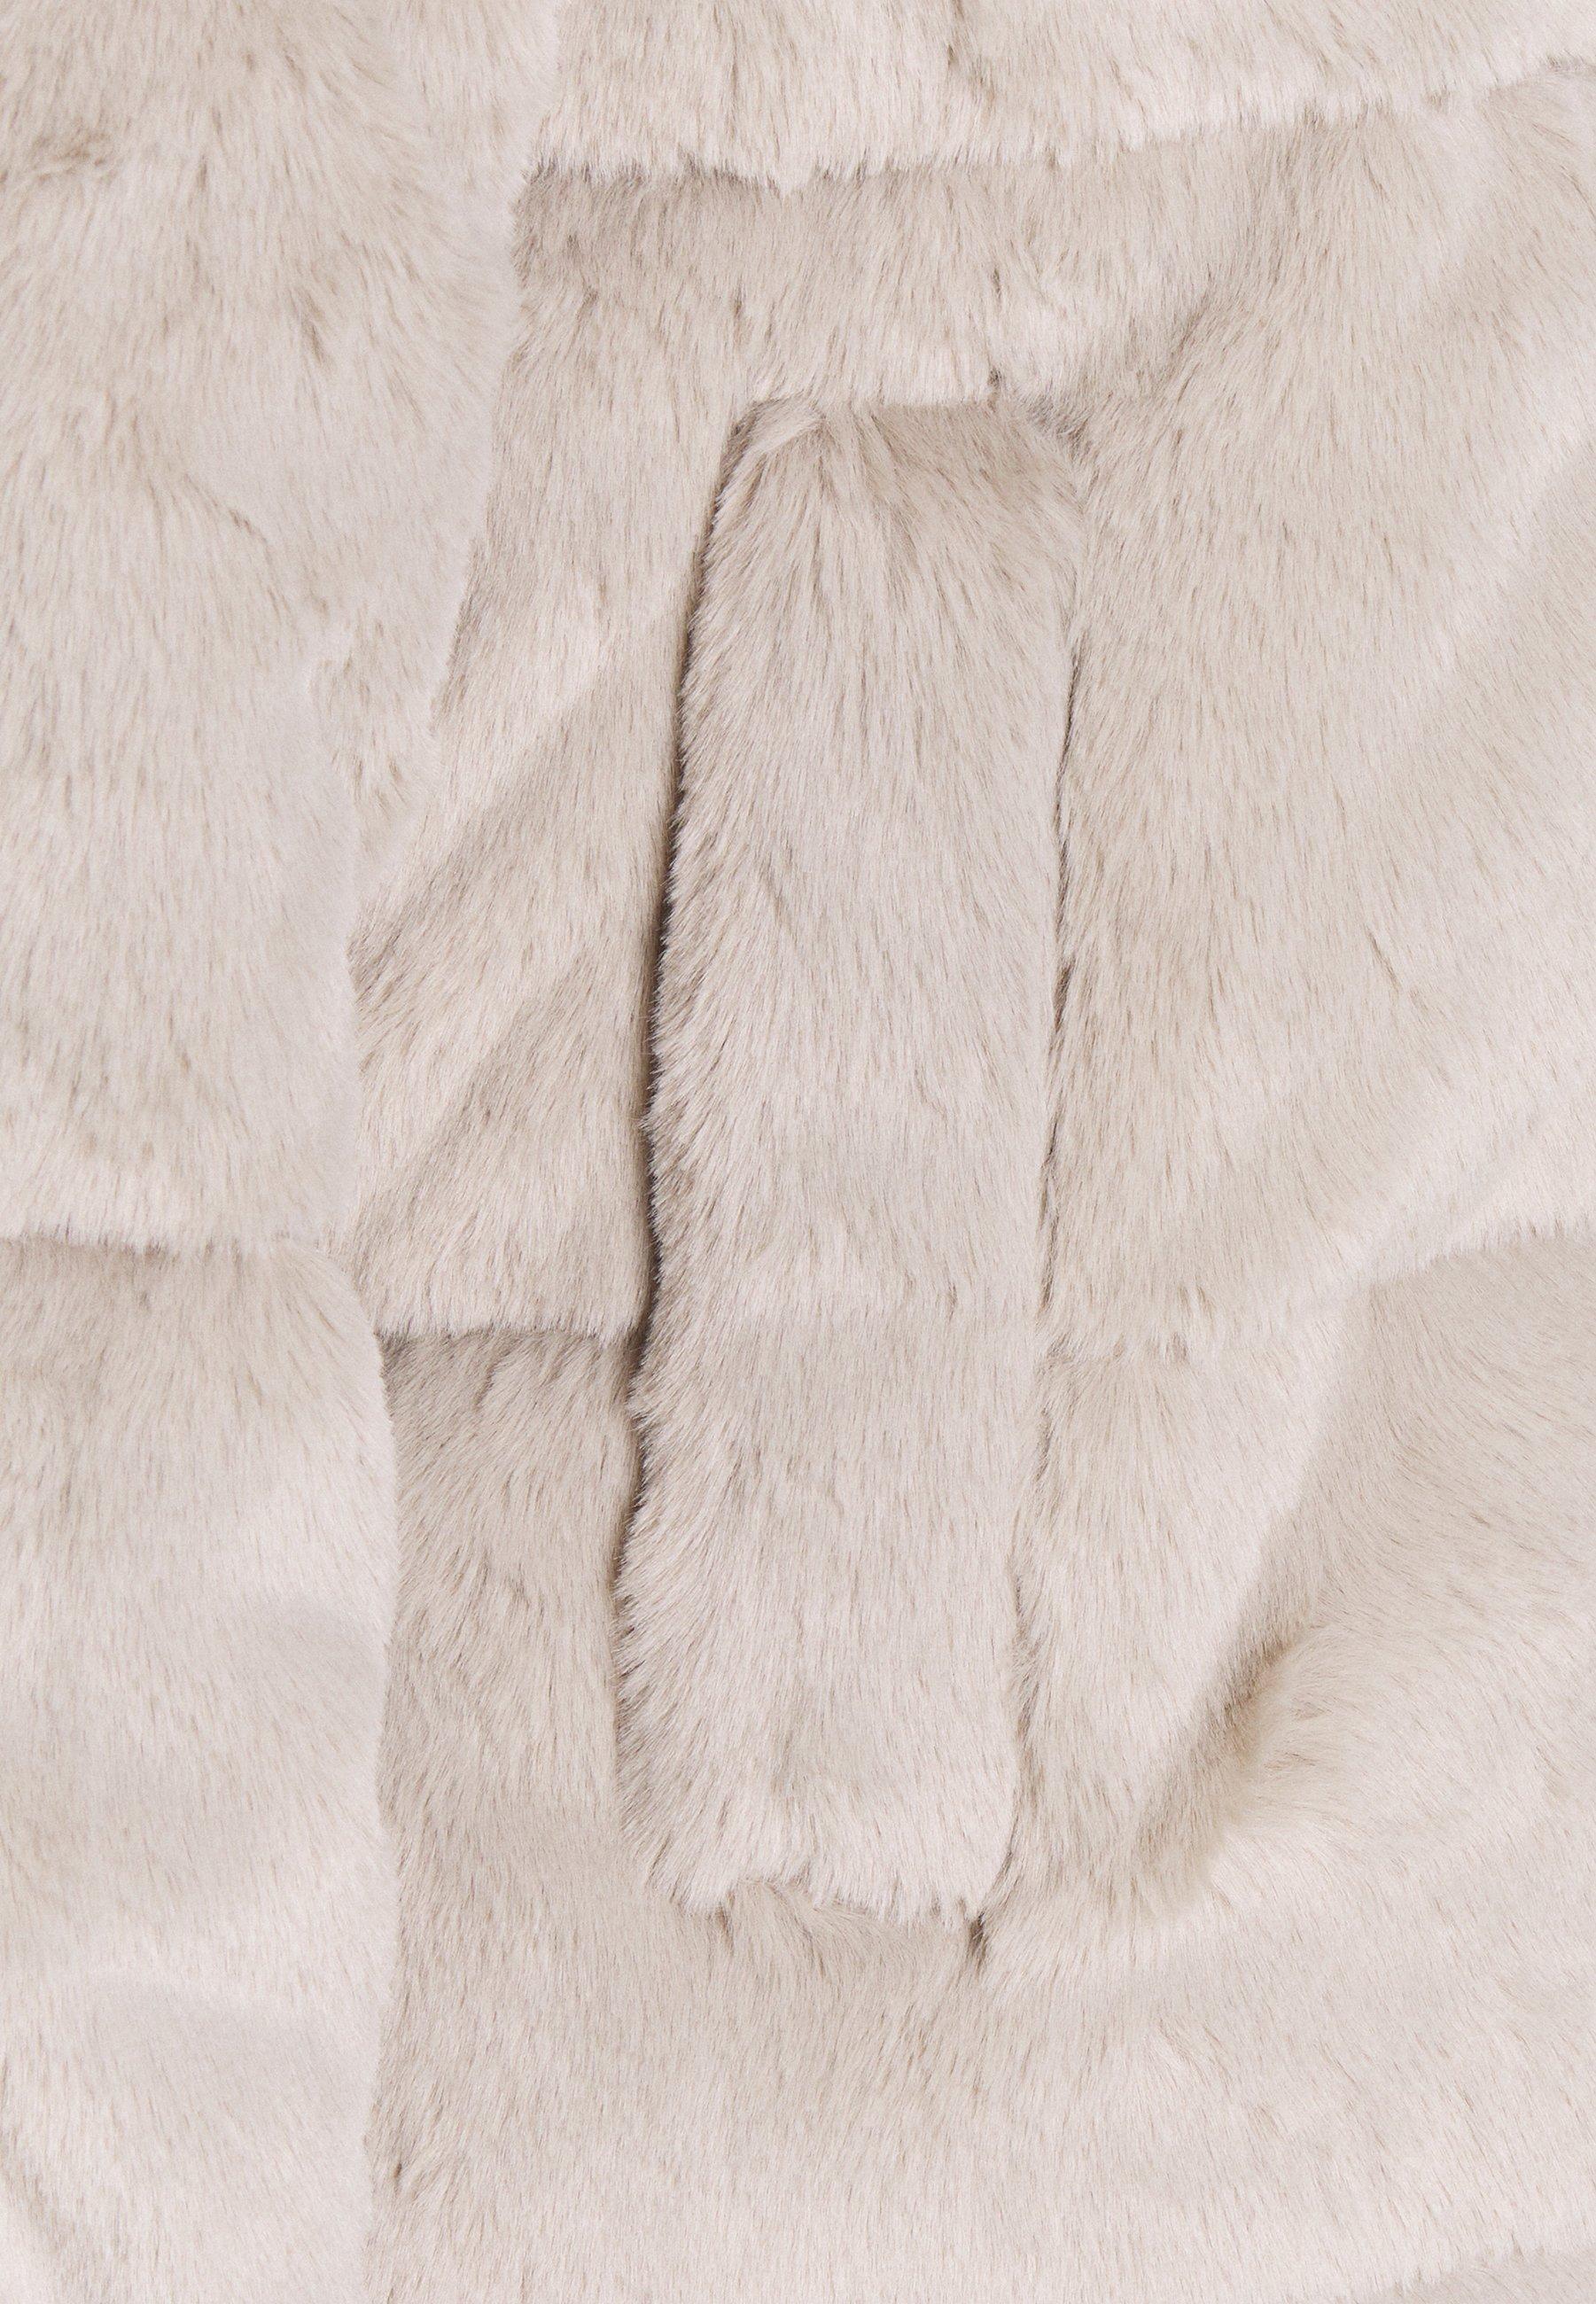 Abercrombie & Fitch MINI PUFFER Winterjacke grey fur/grau